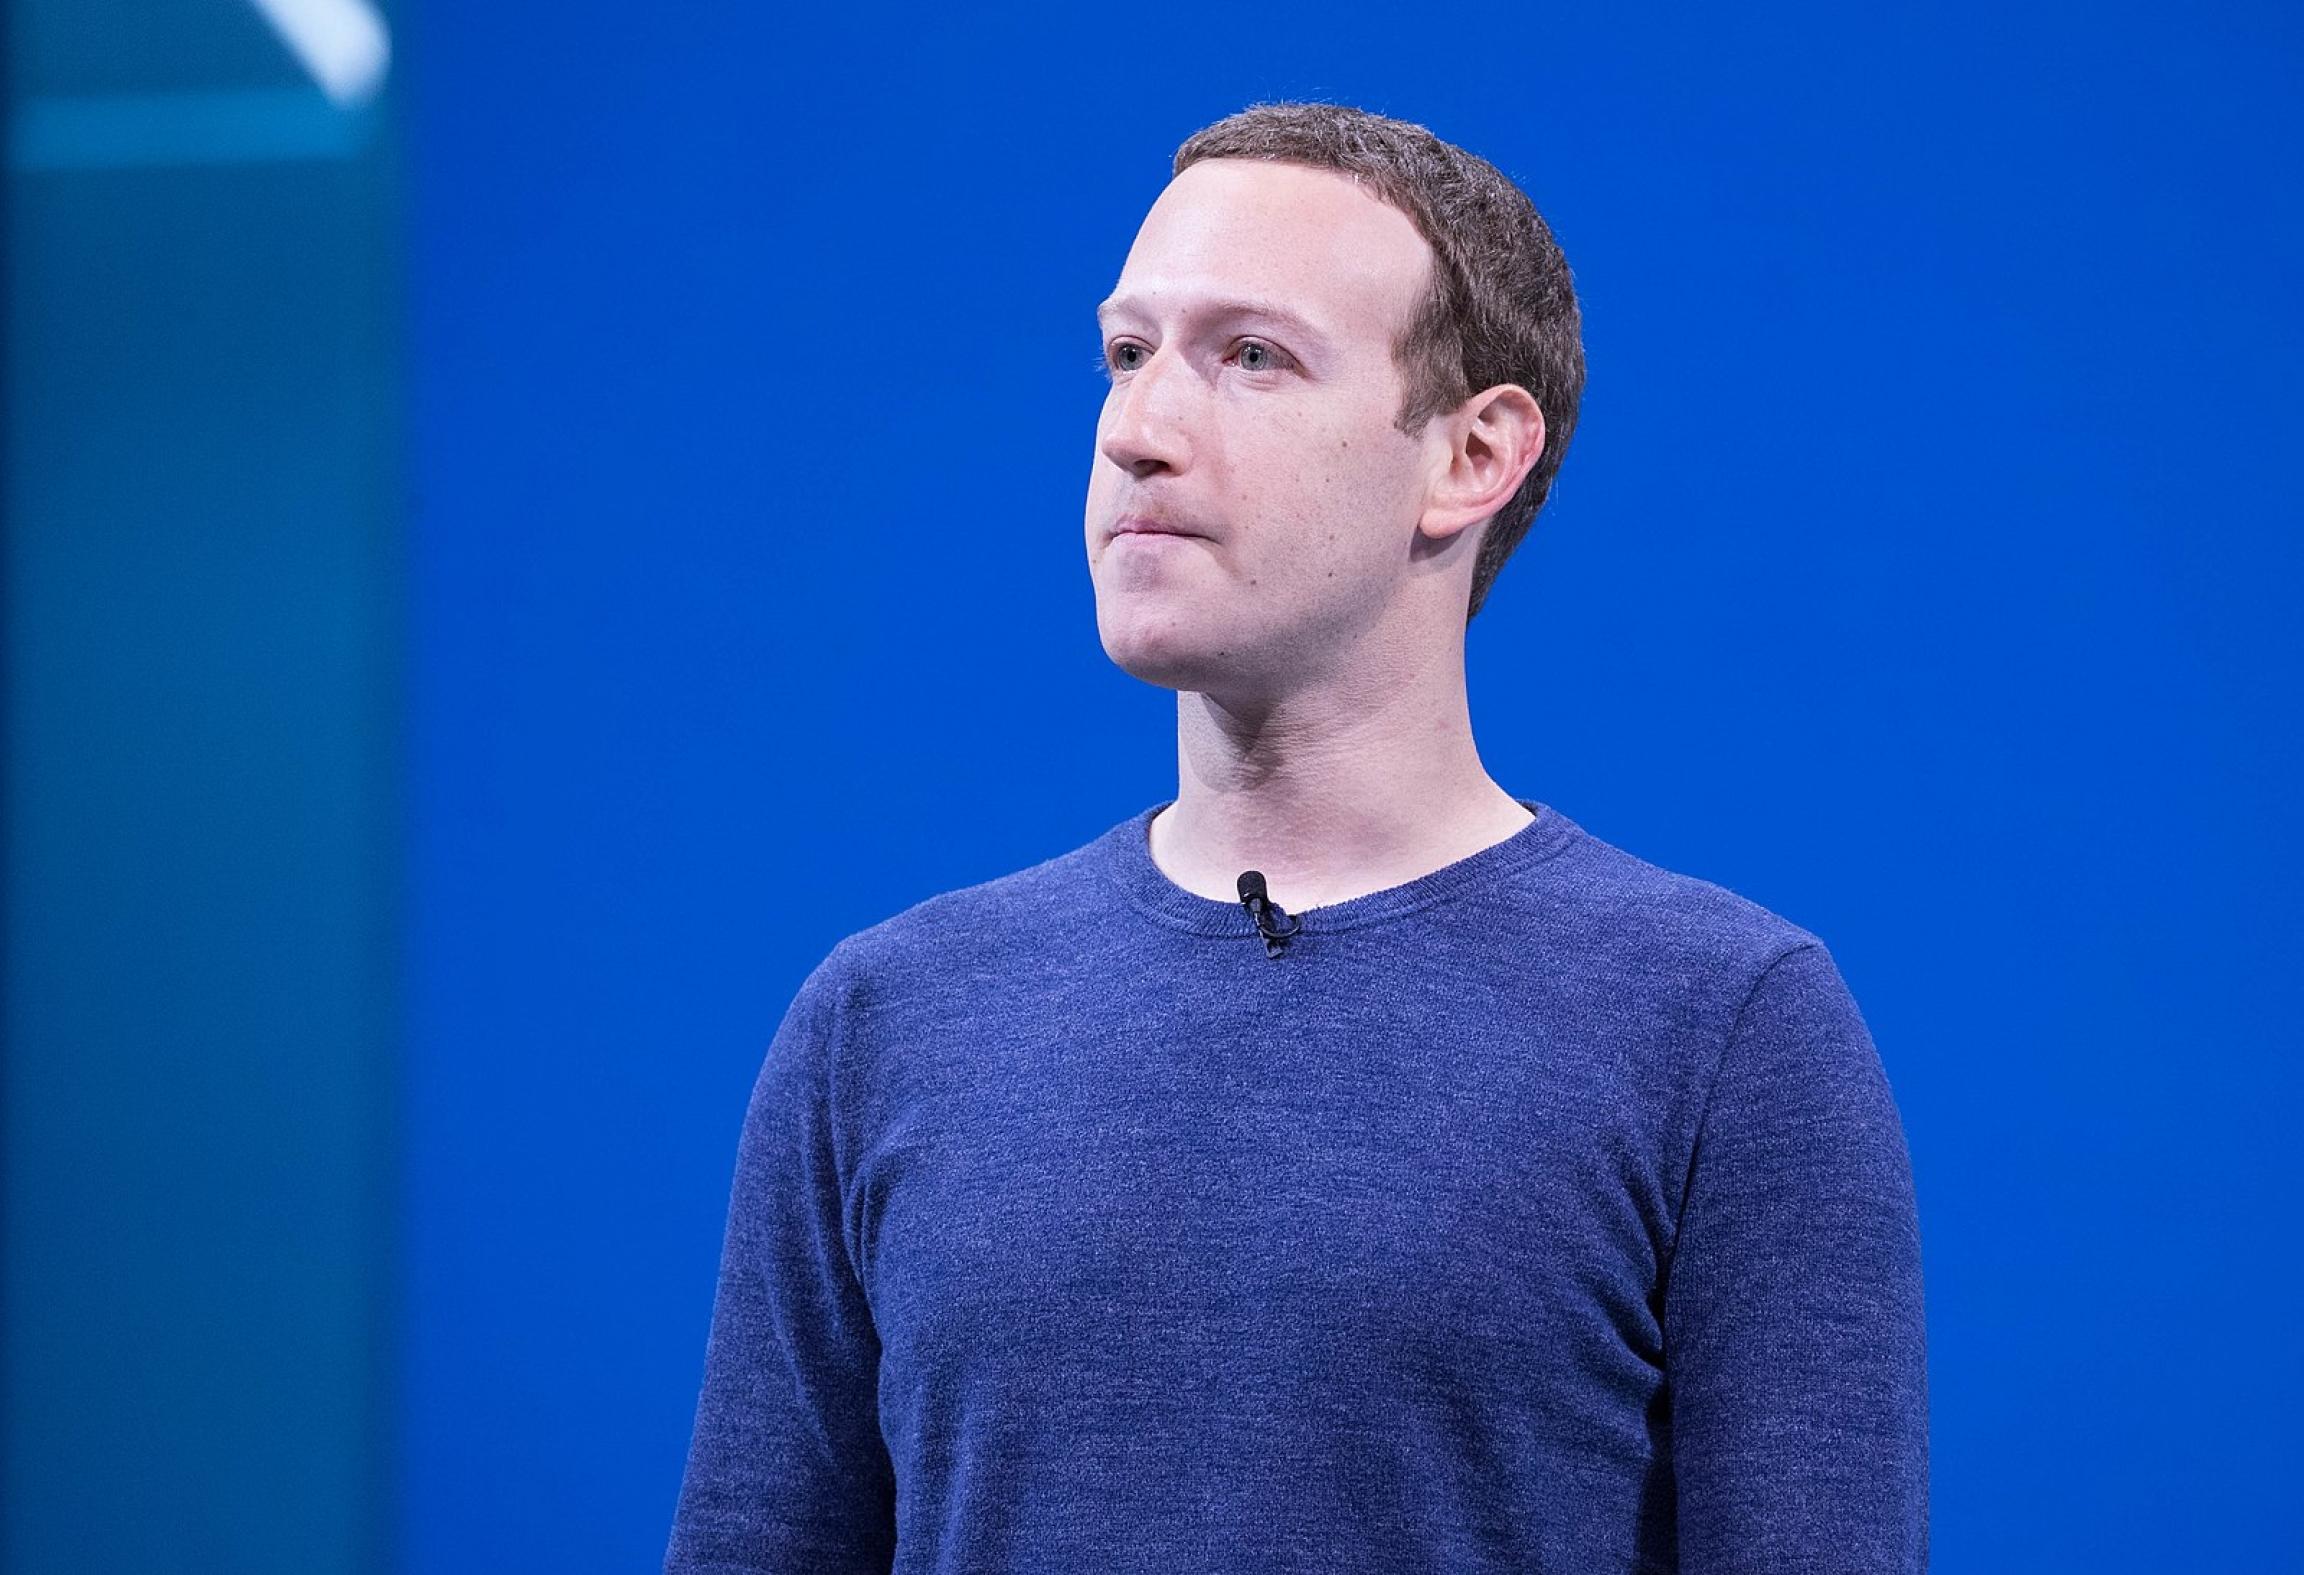 Mark Zuckerberg at the F8 2018 Keynote.